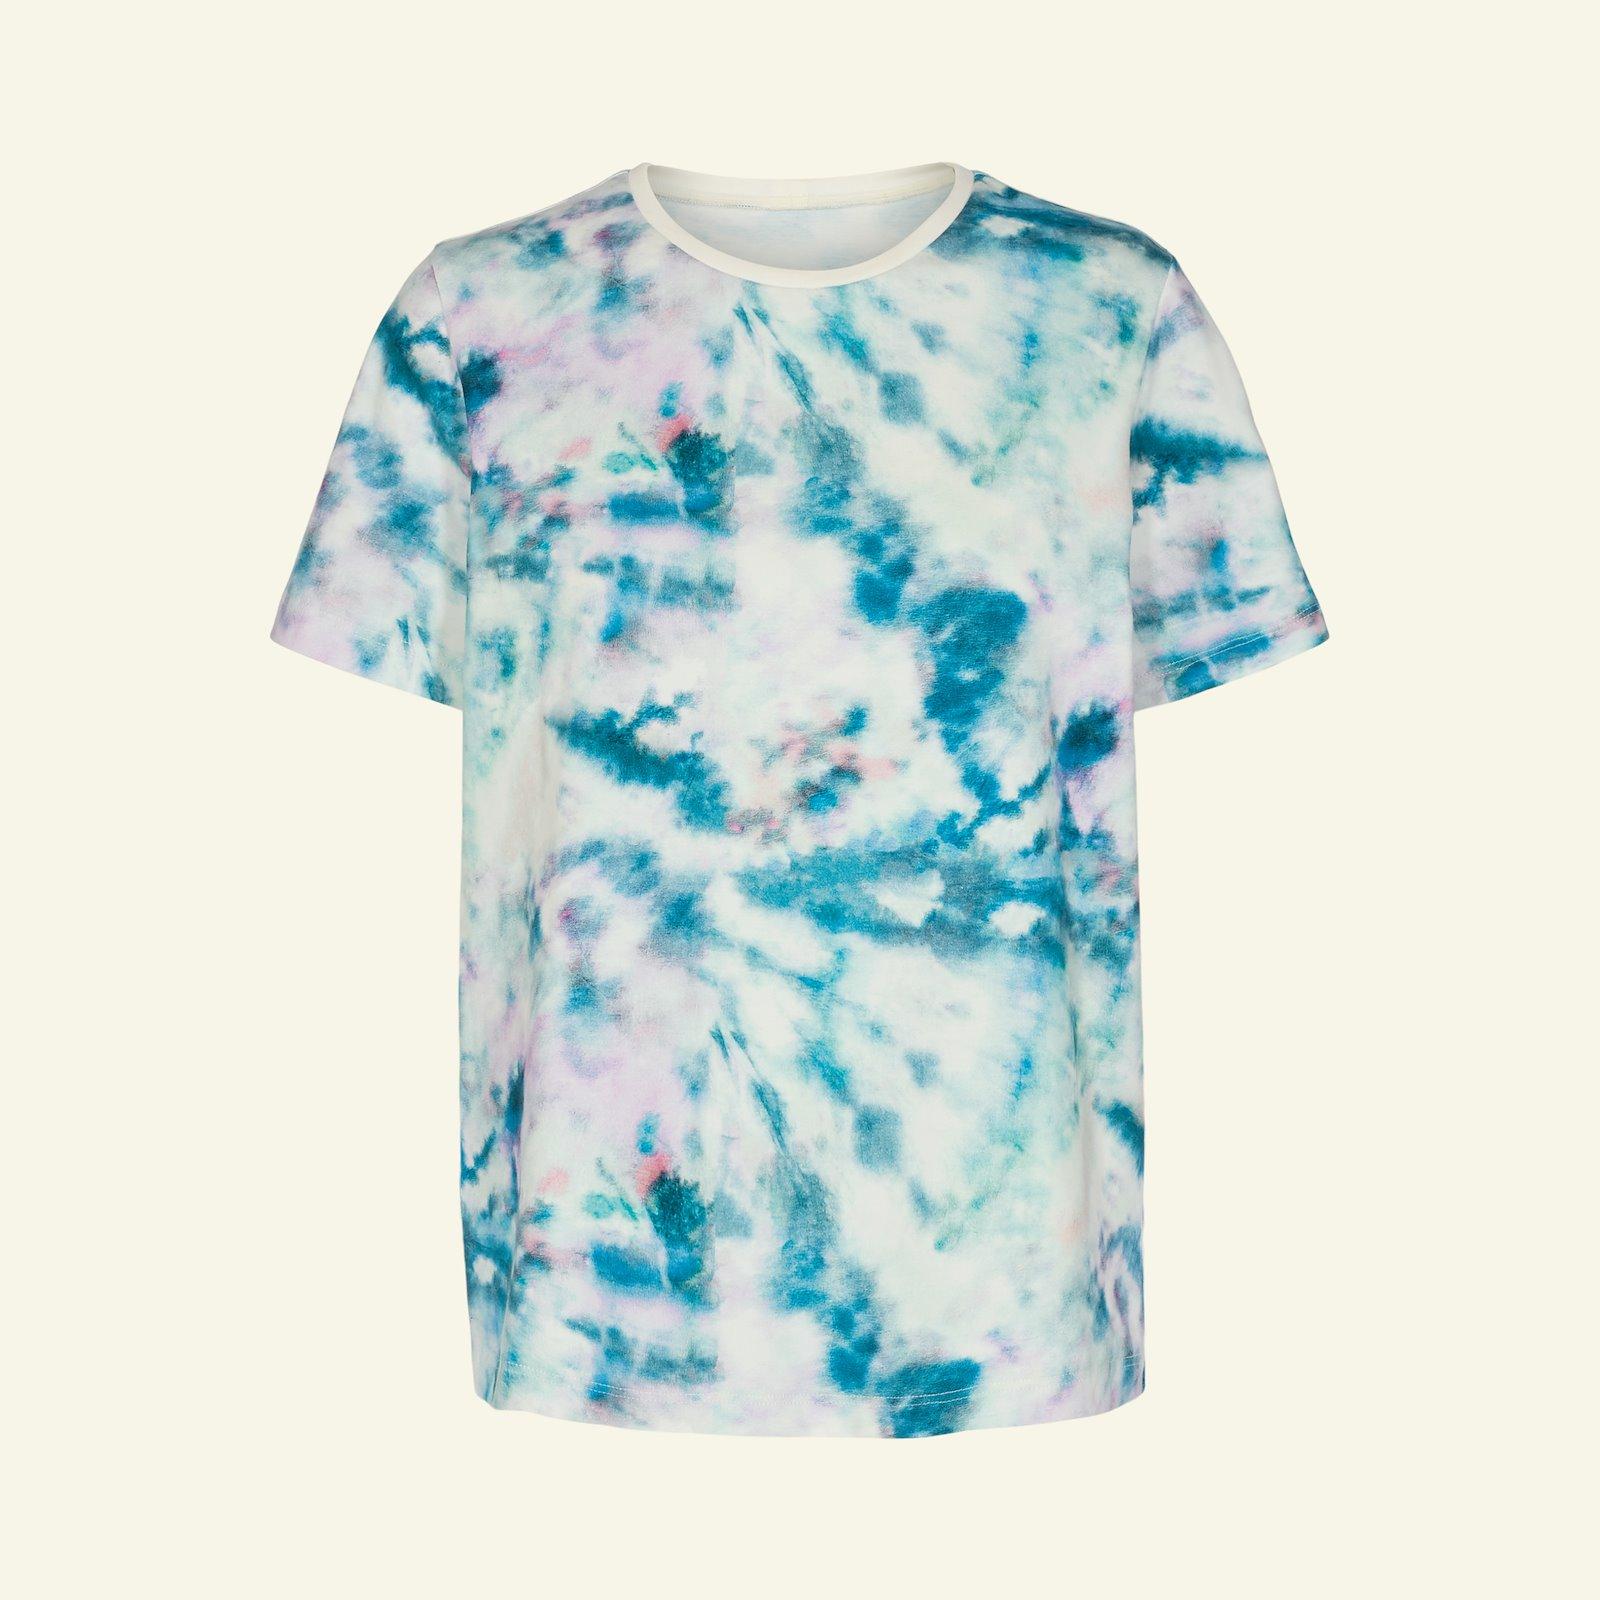 T-shirt and dress, 46/18 p22070_272729_sskit